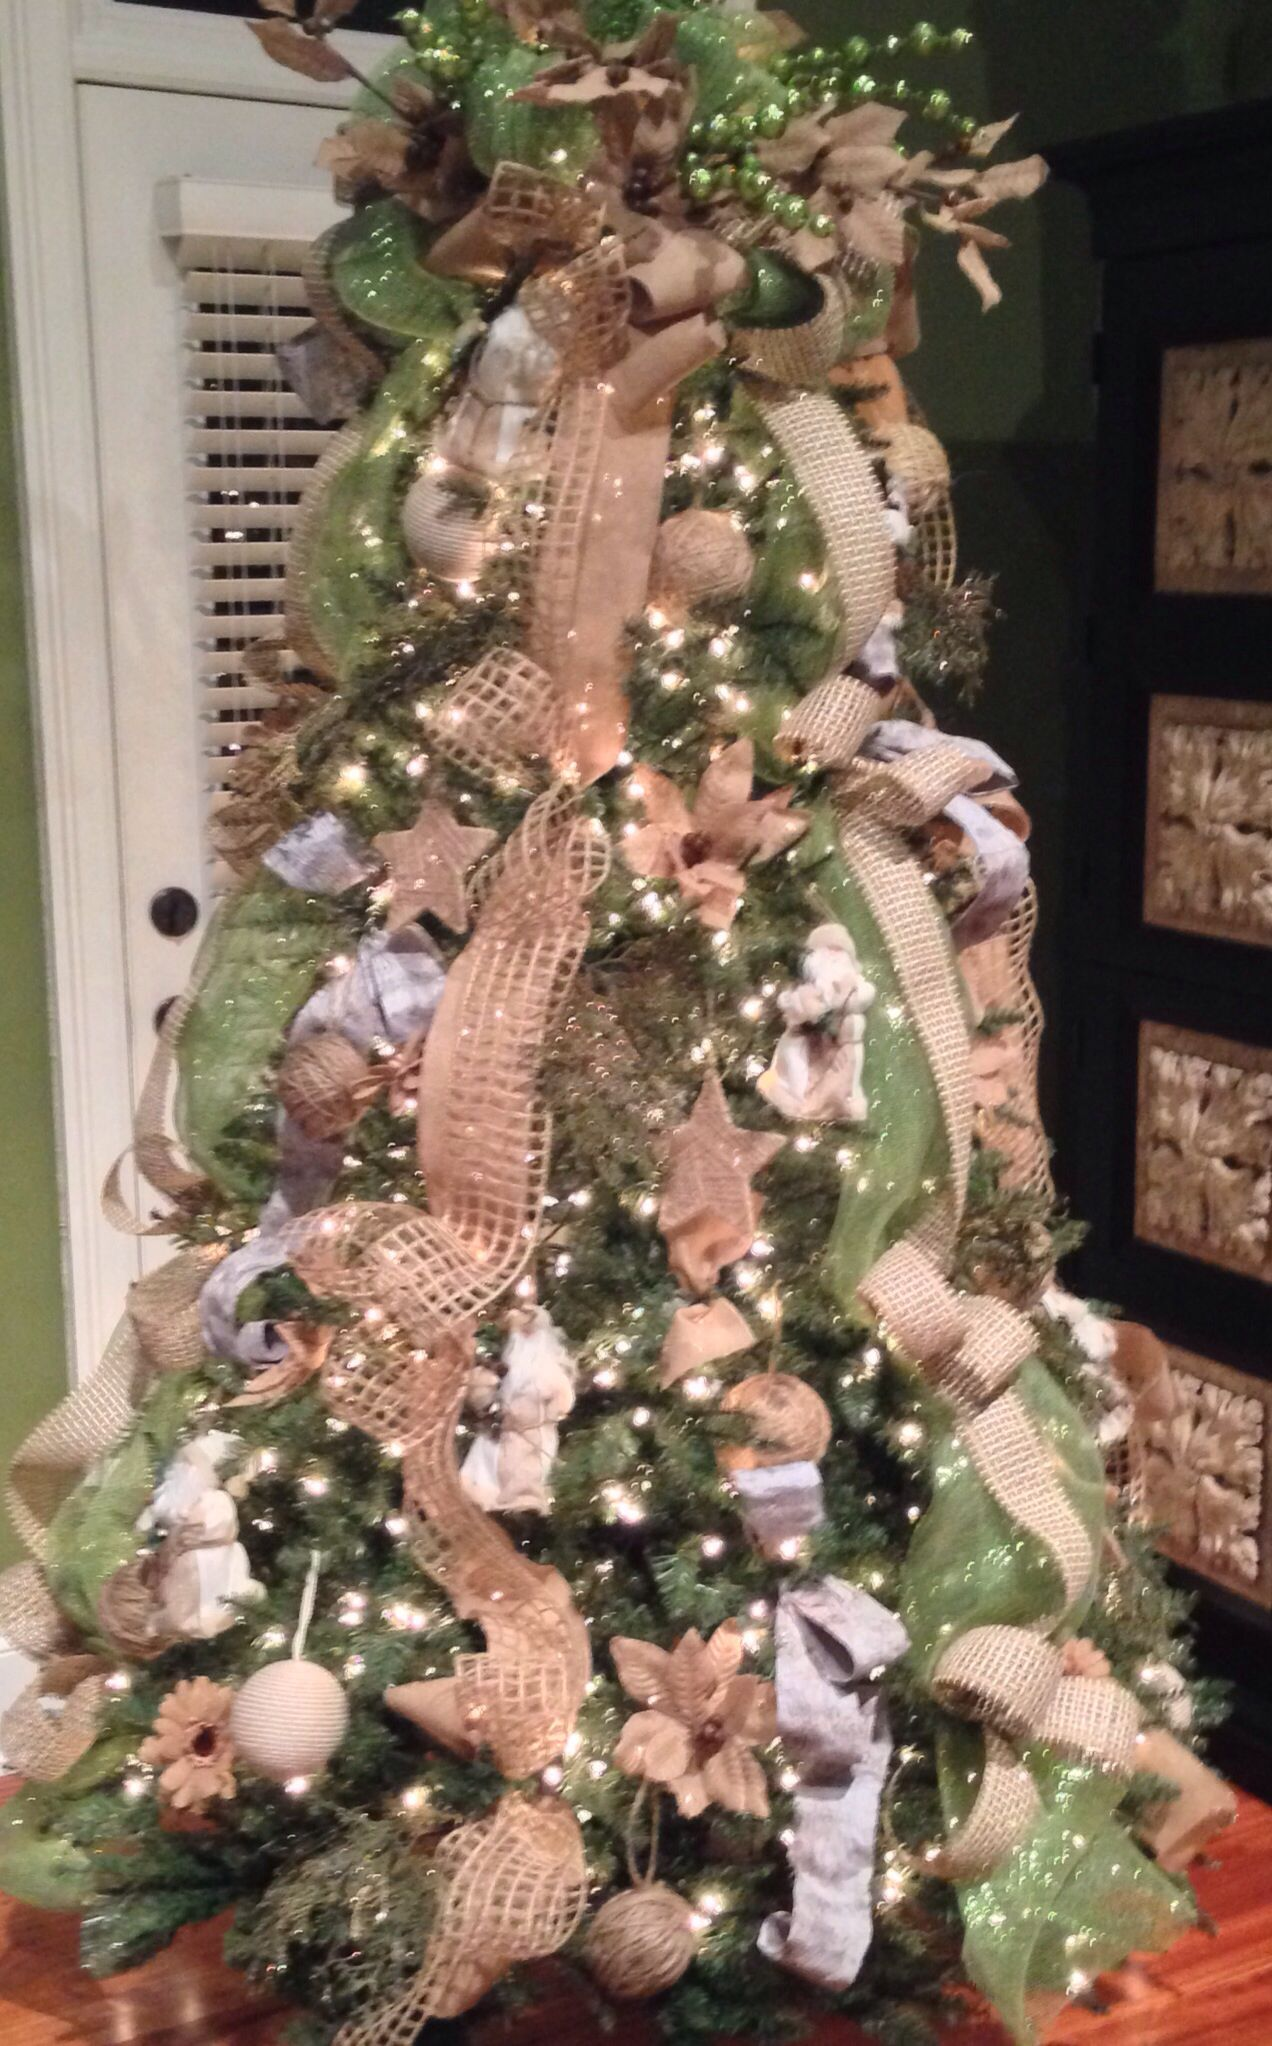 My Burlap Christmas Tree Library 2013